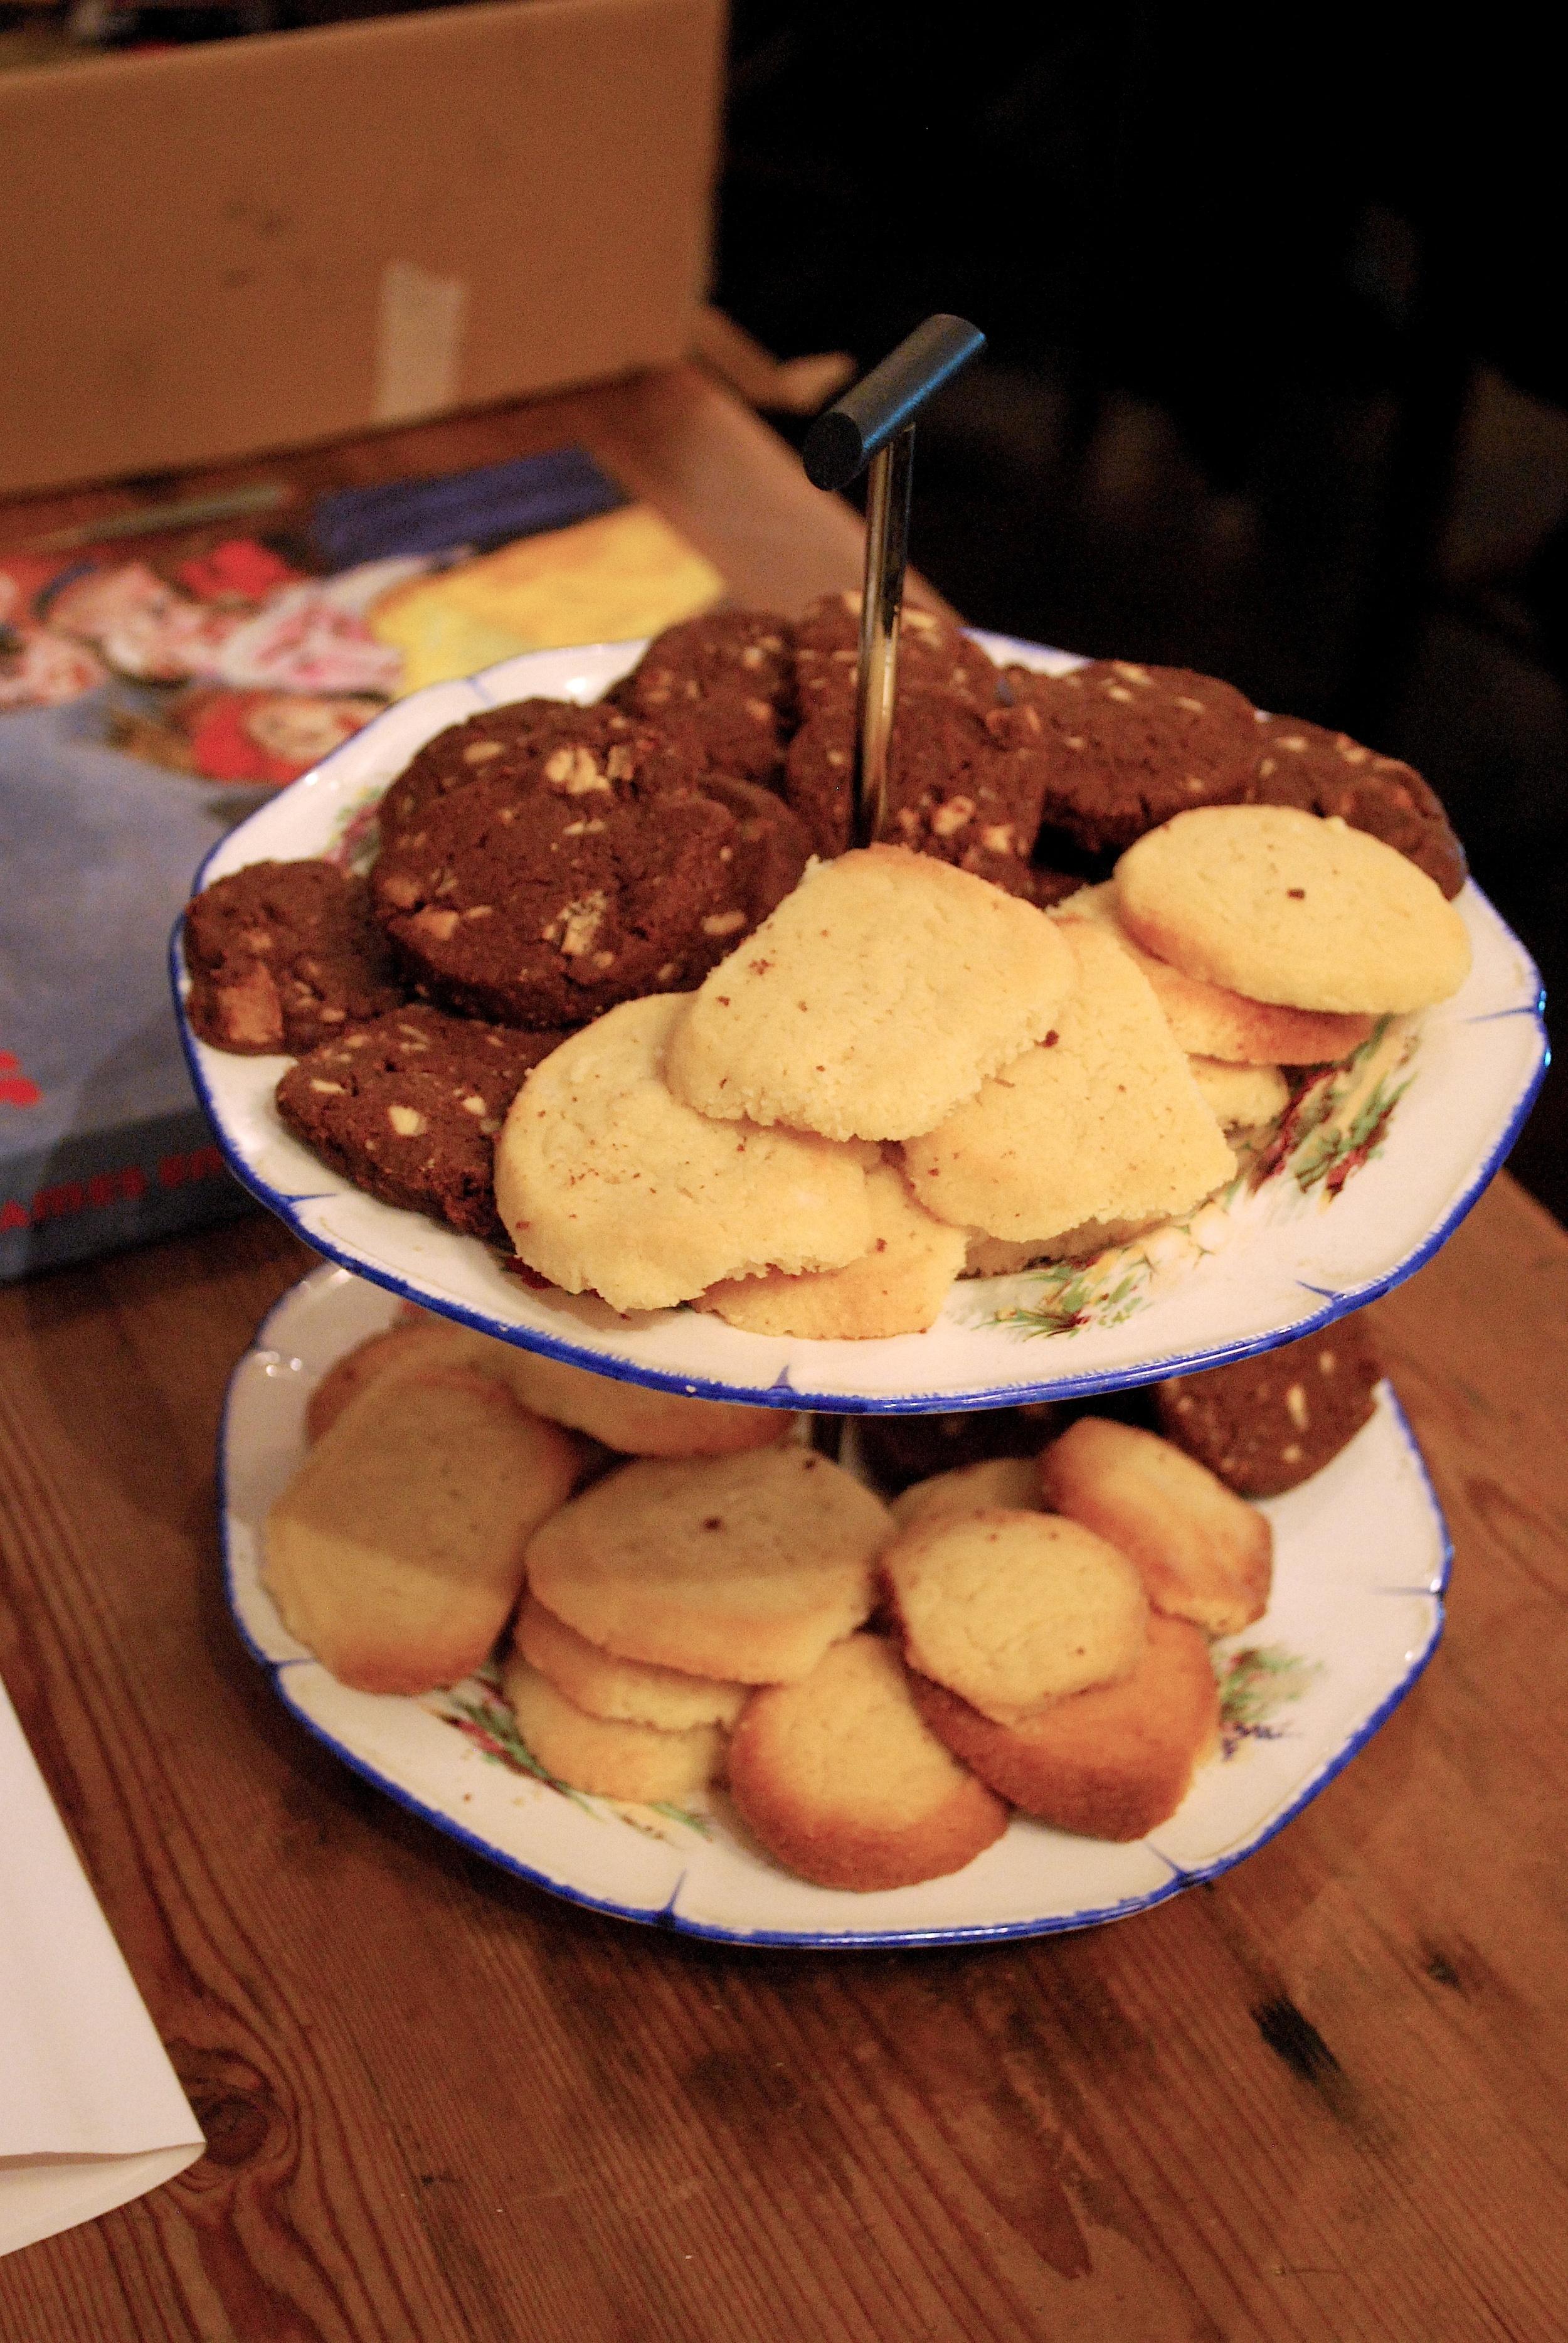 biscuits LR.jpg